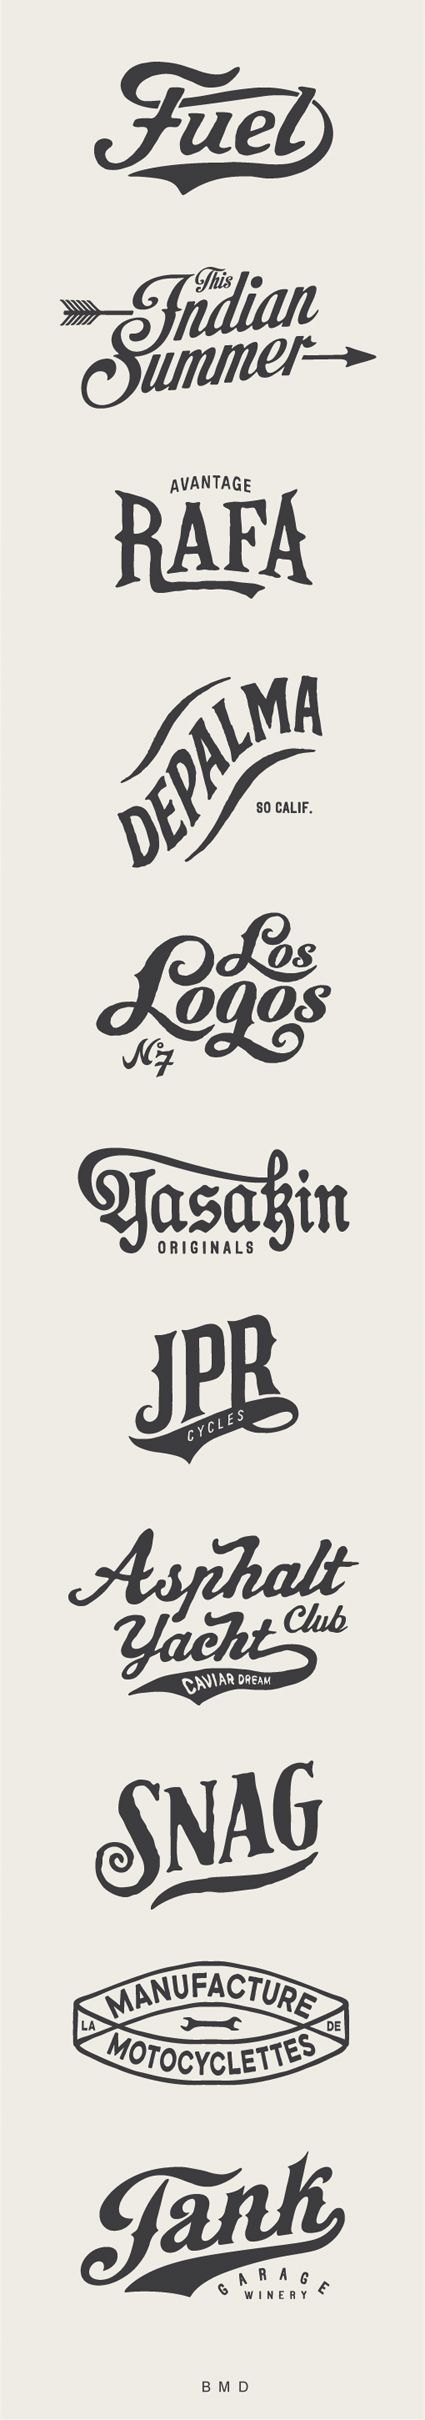 BMD Design / Art Logos